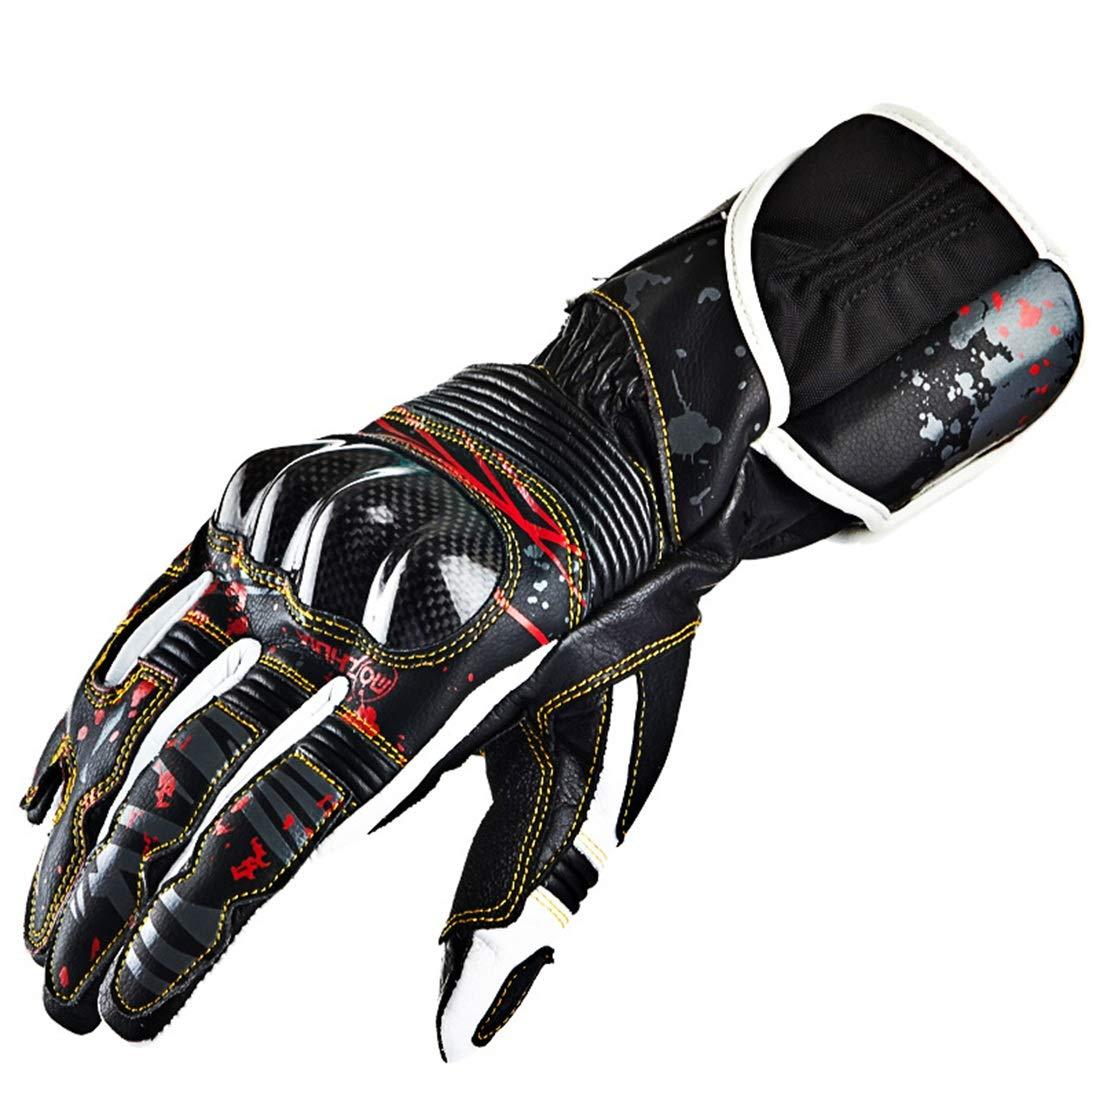 Keriya Sende カーボンファイバーレザーオートバイグローブレーシングナイトグローブクライミングハイキングアウトドアスポーツ用品 (サイズ : XXL) XX-Large  B07RKT3R4N